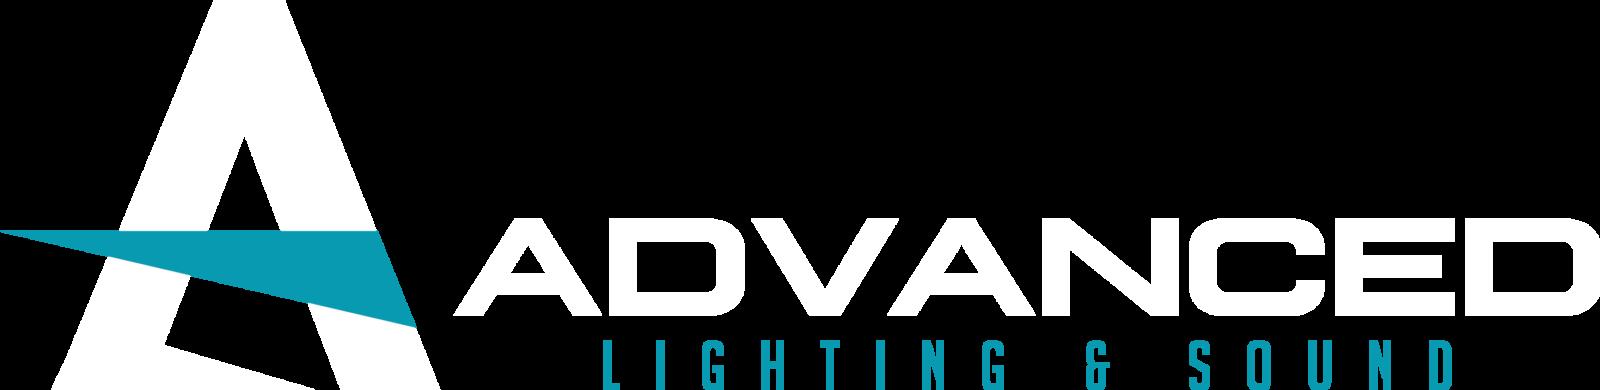 Advanced Lighting & Sound